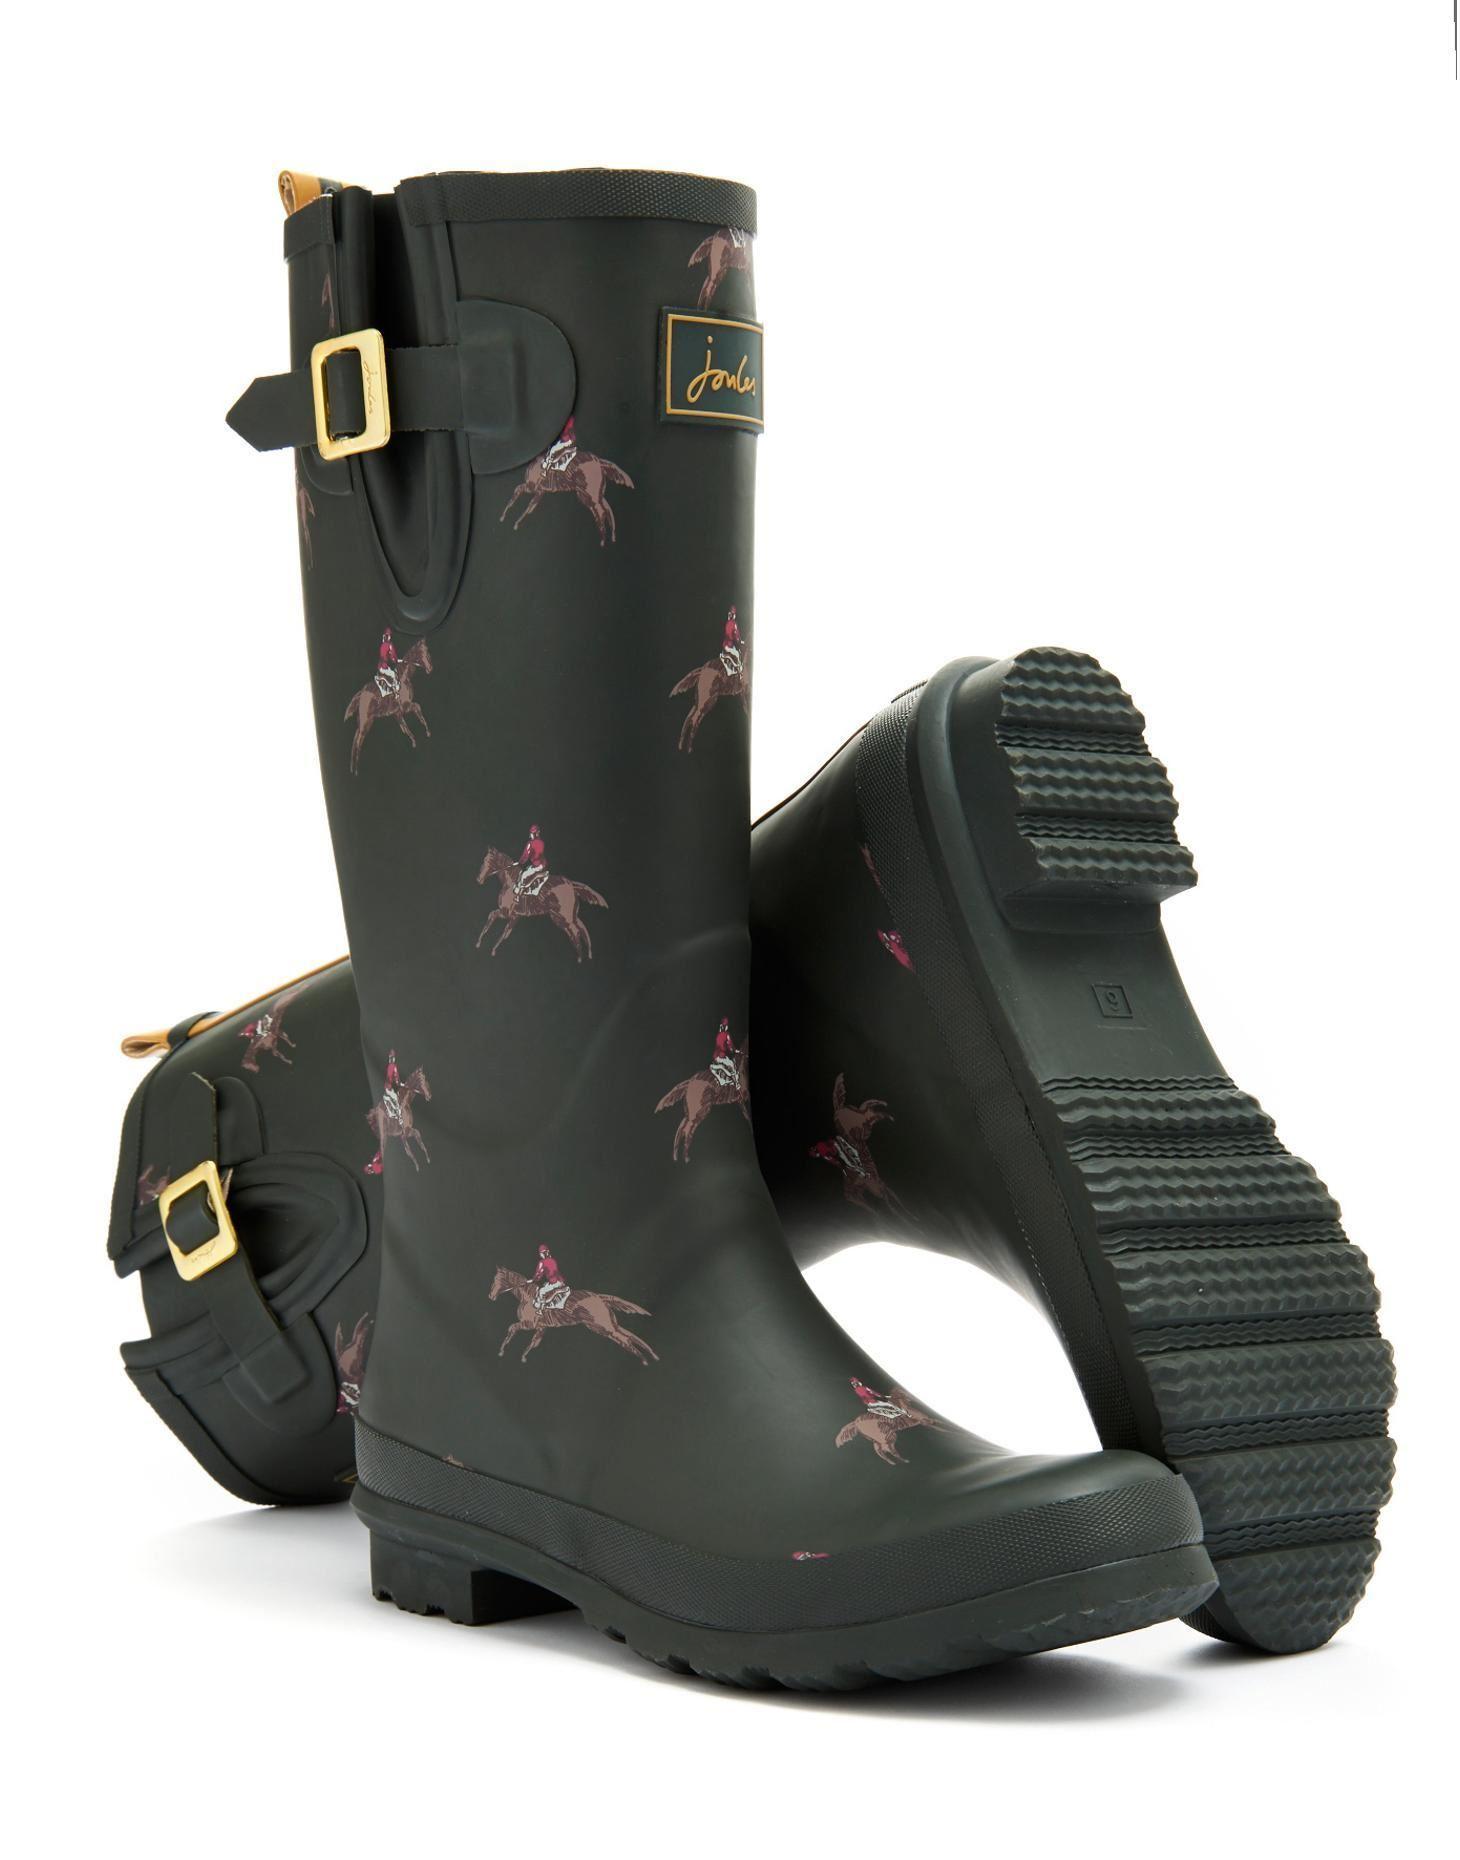 Joules Design Print Women Waterproof Fashion Rain Festival ...